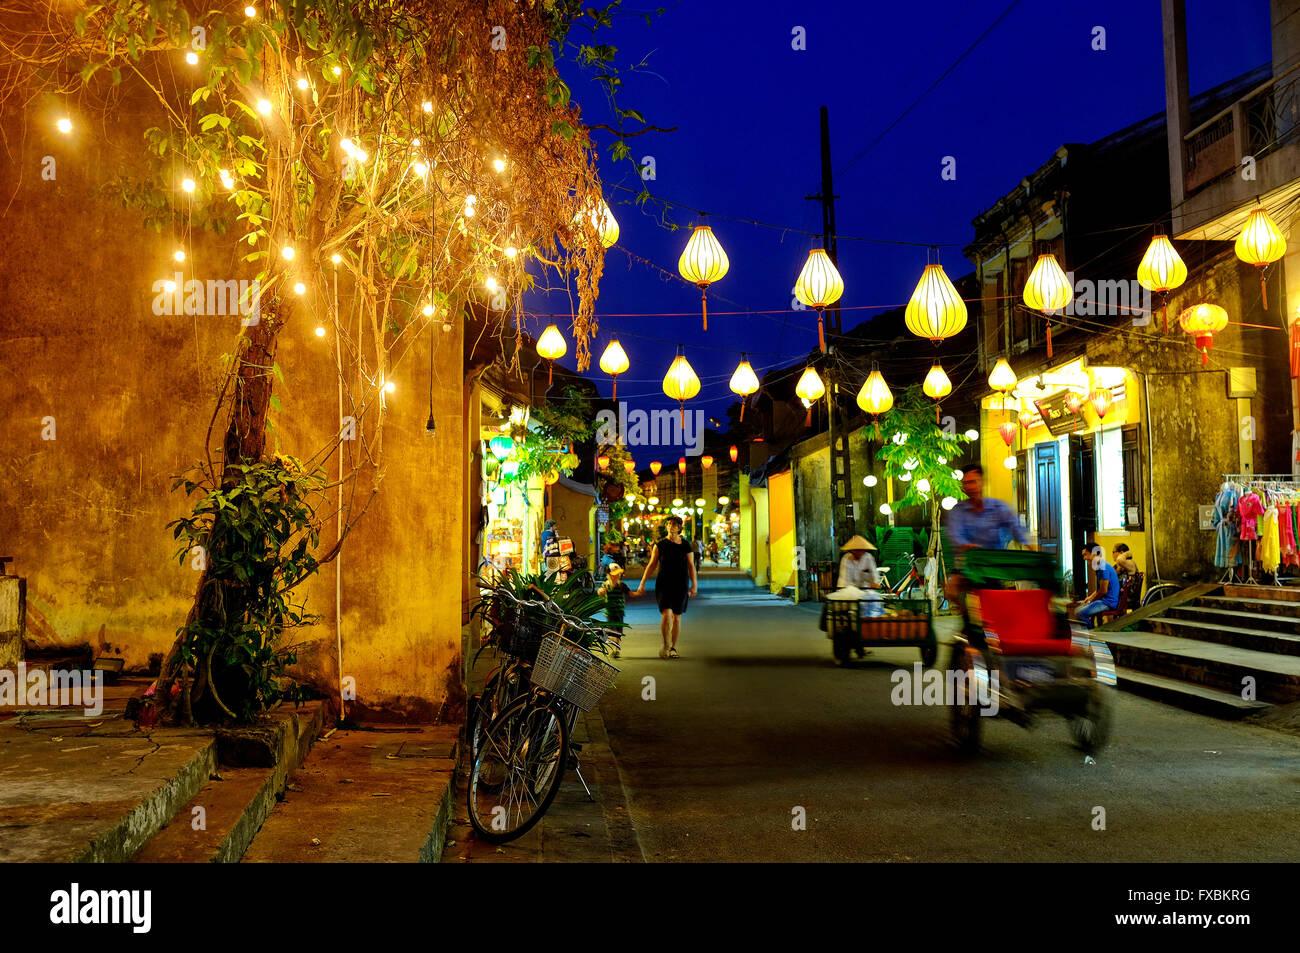 Nguyen Thai Hoc en la calle de noche, Hoi An, Vietnam Imagen De Stock